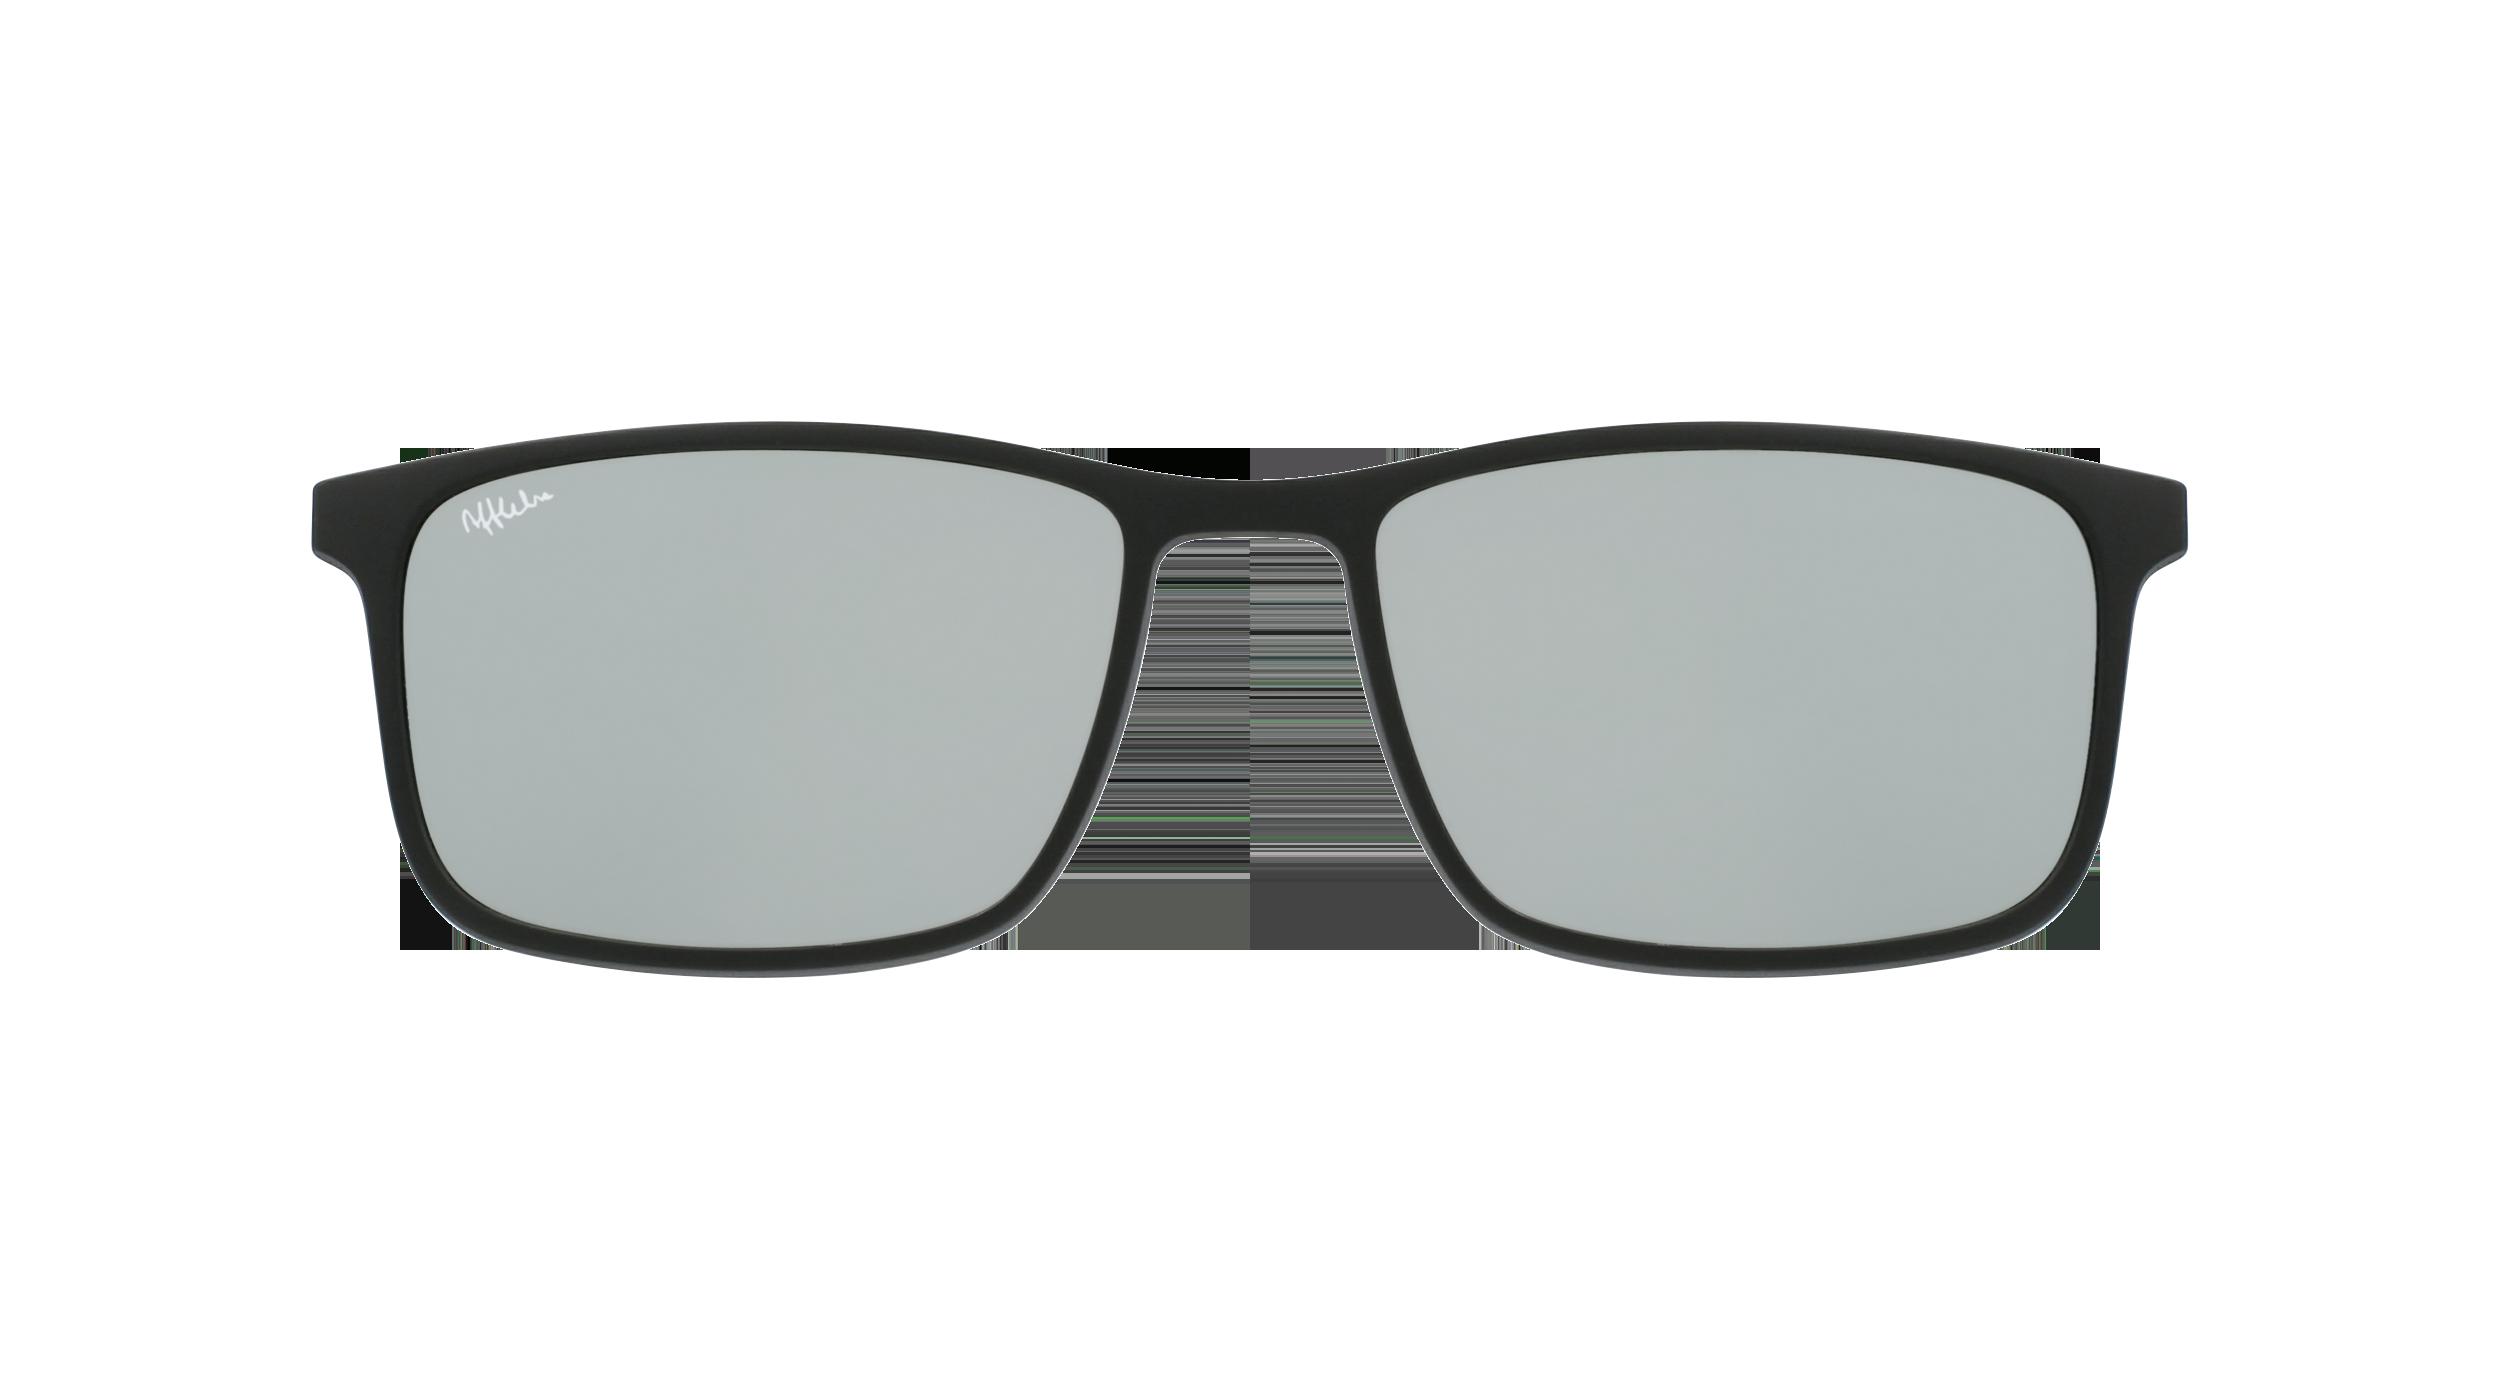 afflelou/france/products/smart_clip/clips_glasses/07630036458716.png